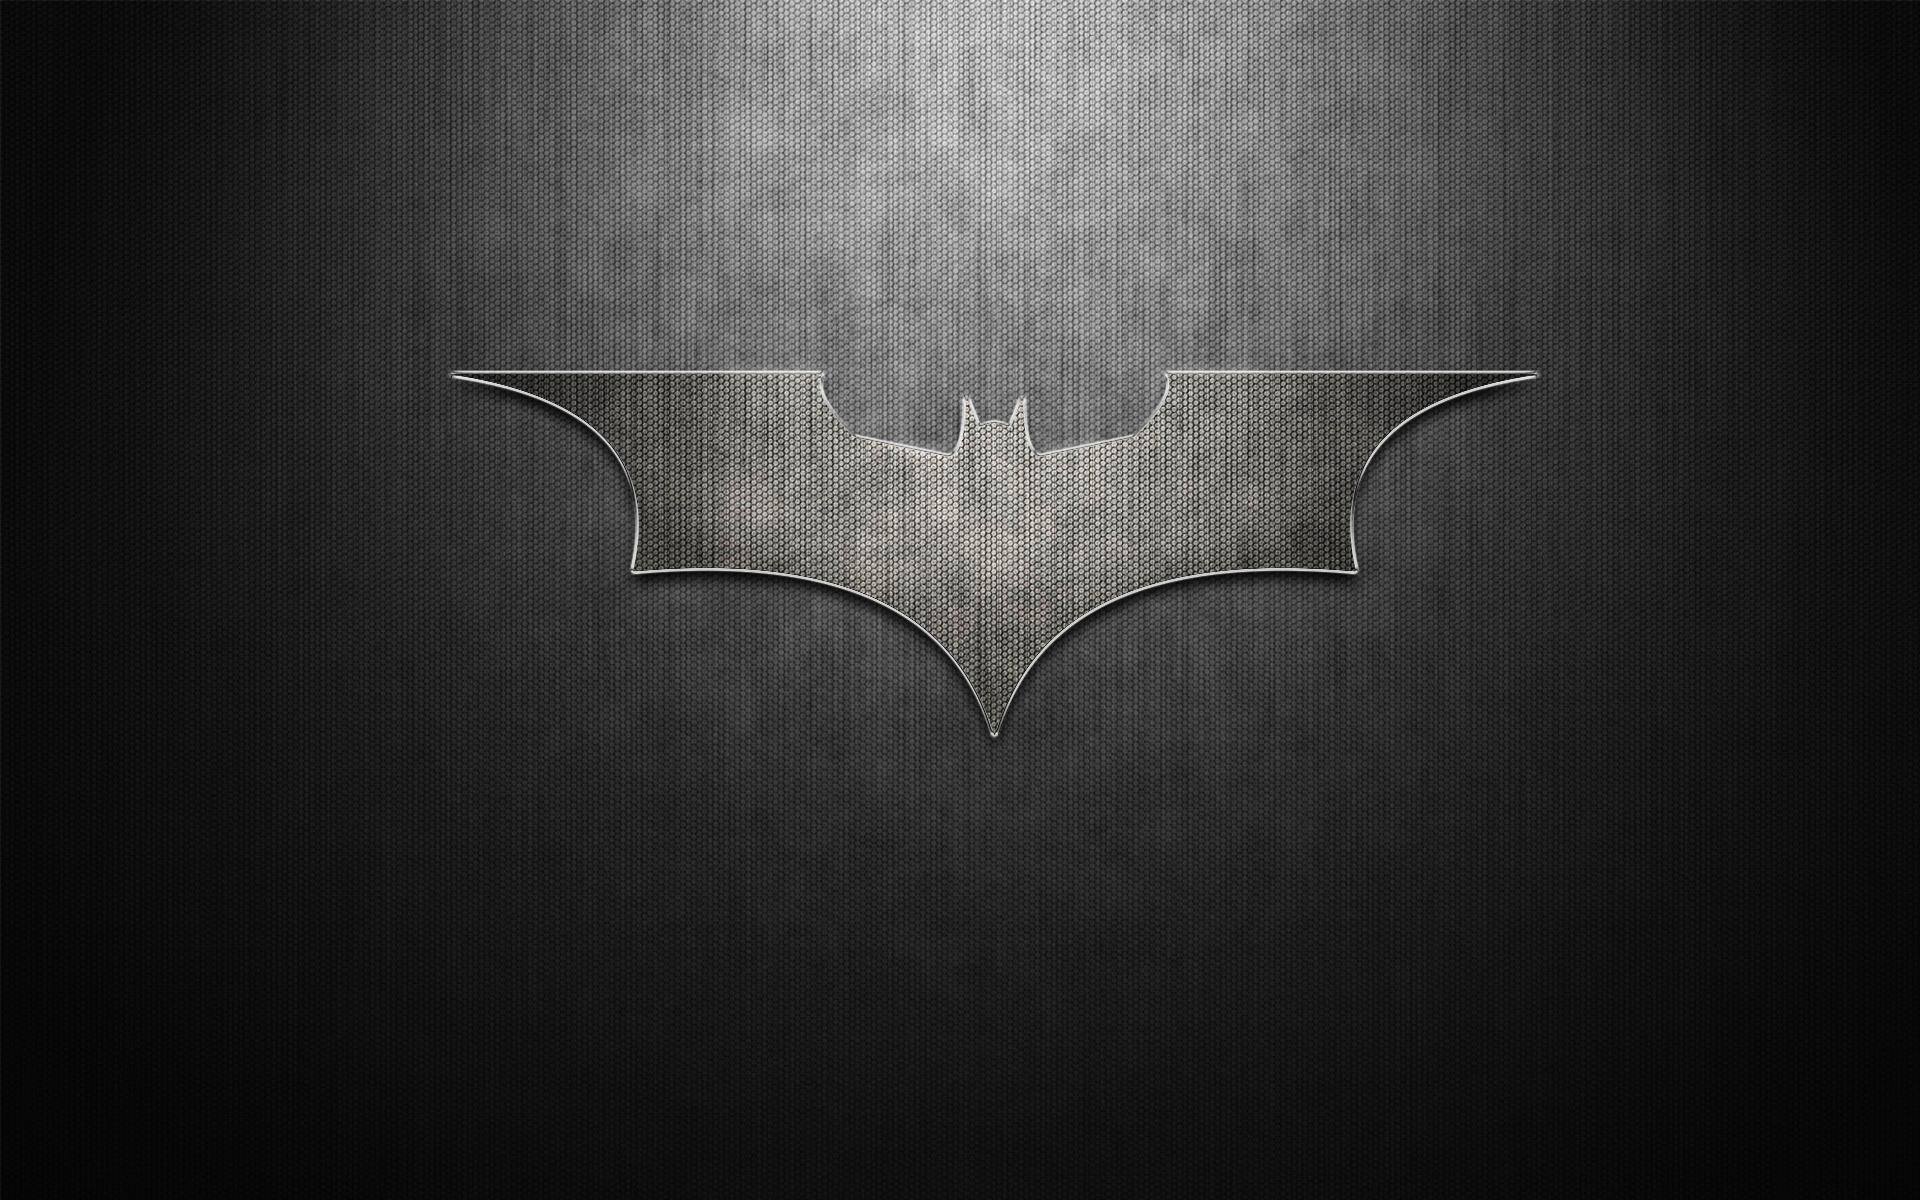 Batman Logo wallpaper Download free amazing High Resolution